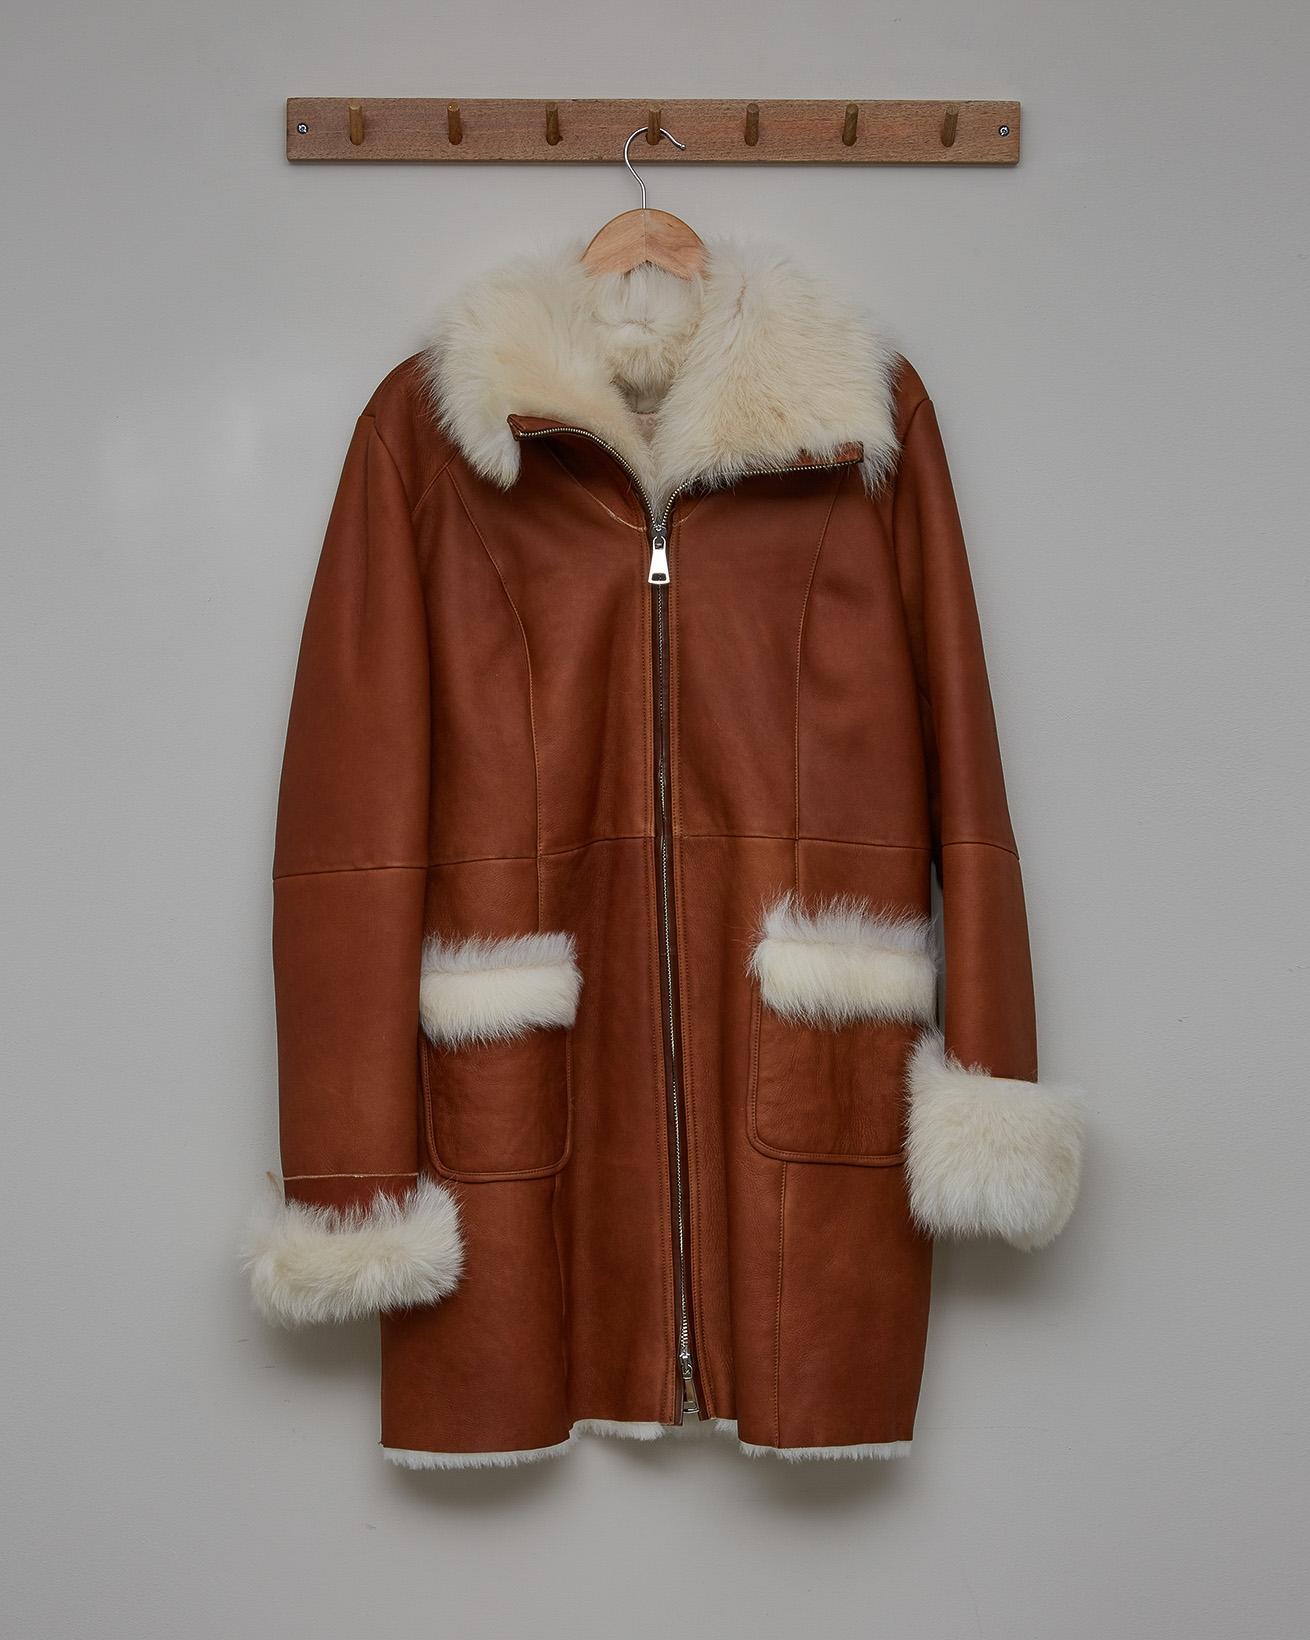 Toscana Trim Zip Up Coat - Honey - Size 14 - 2709